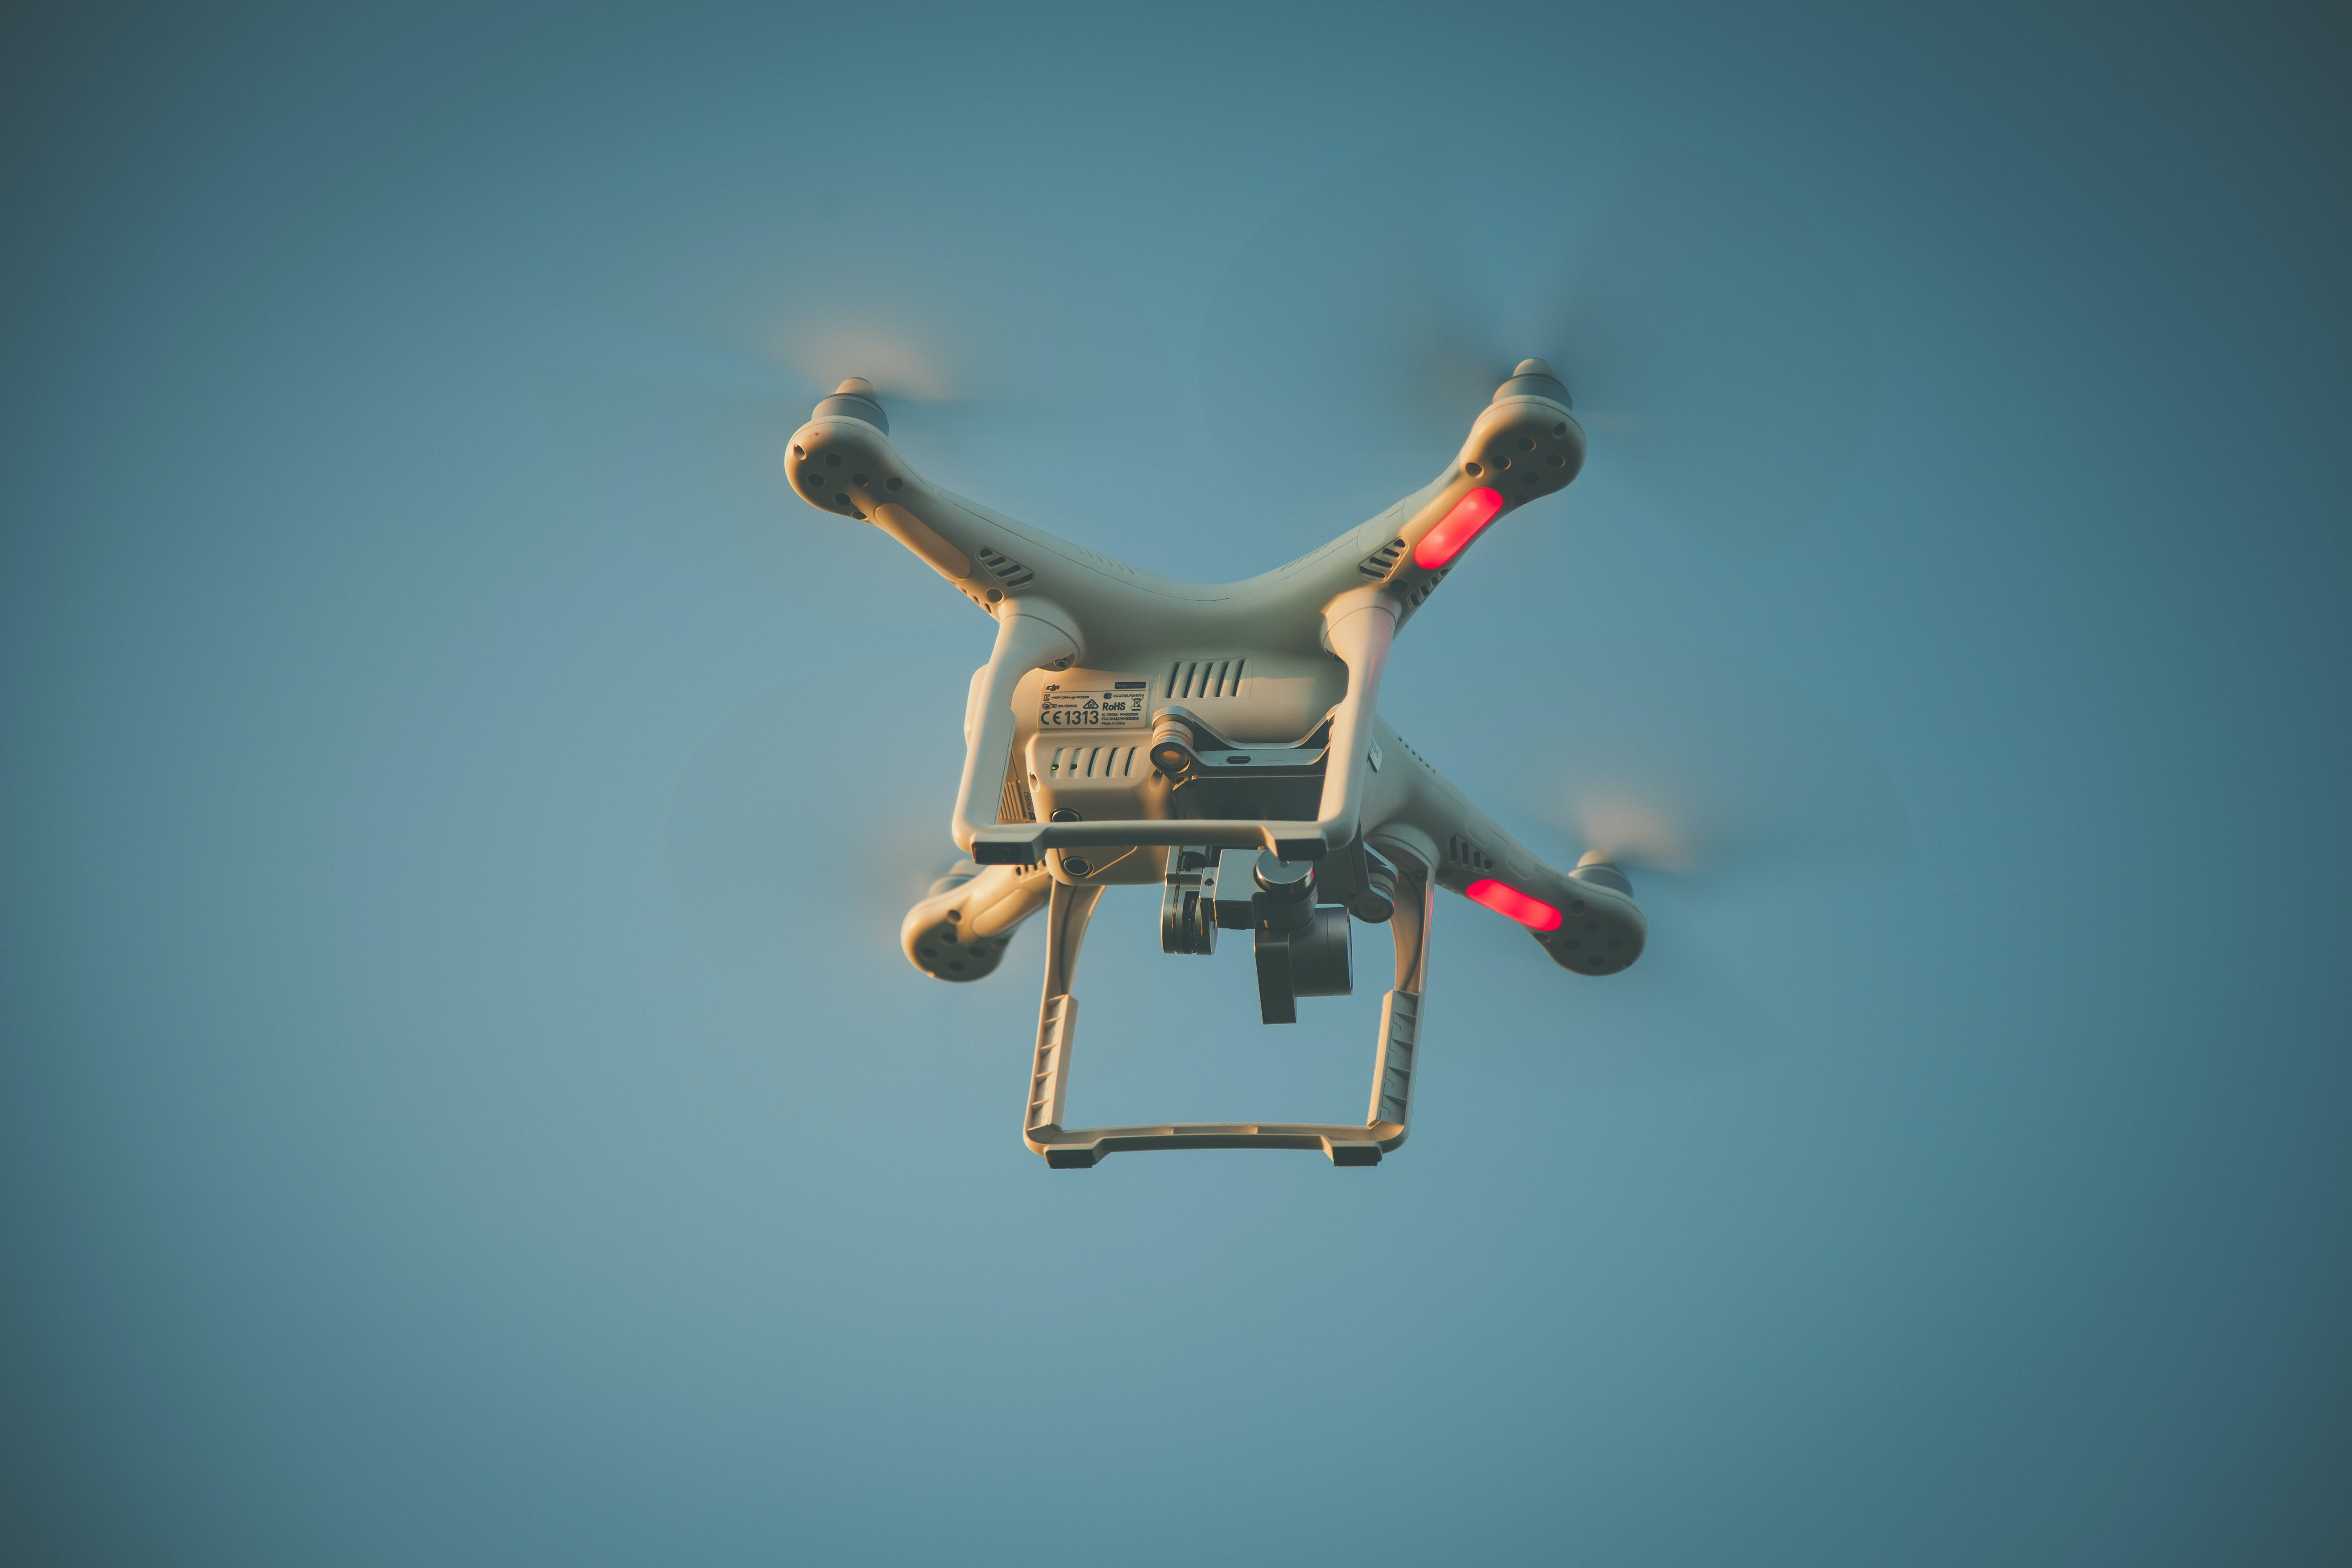 DJI, 低角度拍攝, 天空, 技術 的 免费素材照片